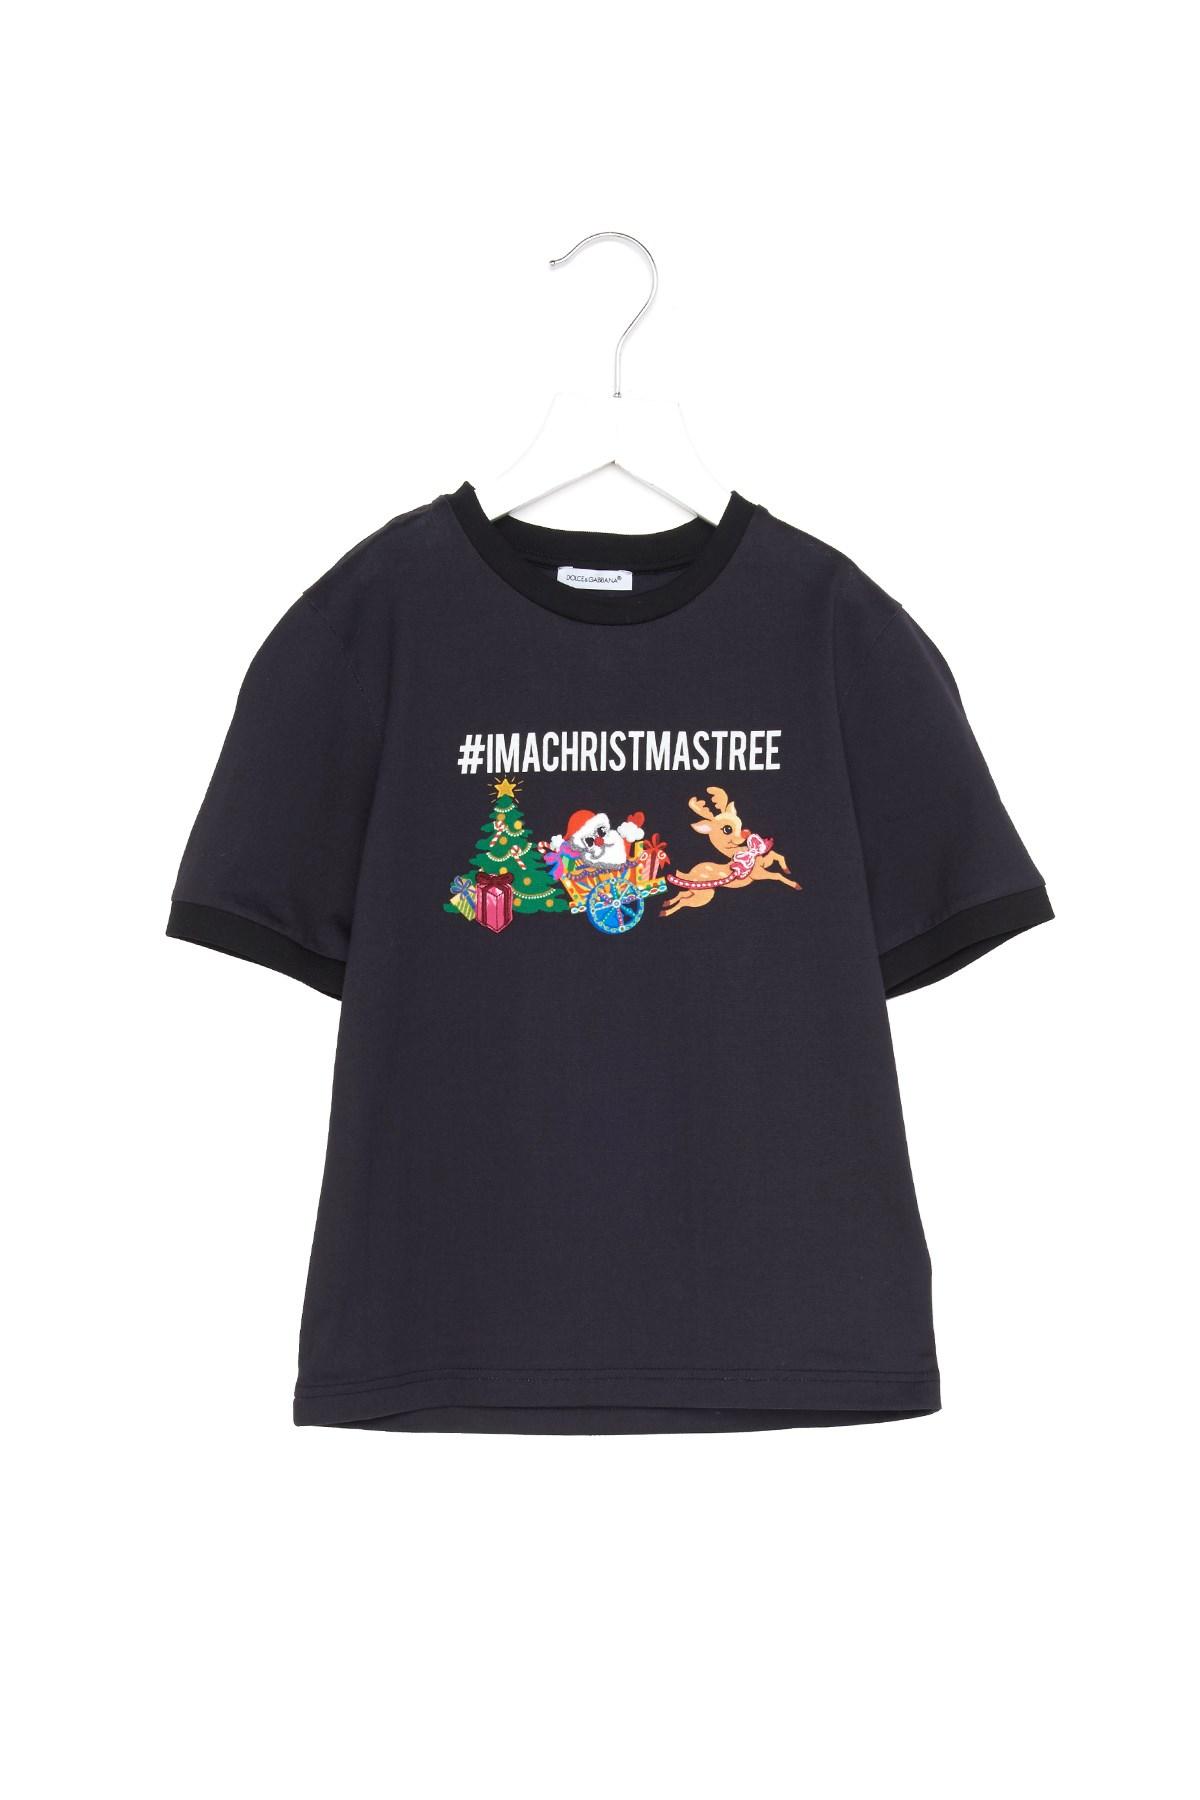 d643921b Christmas T Shirt Size 18 - DREAMWORKS